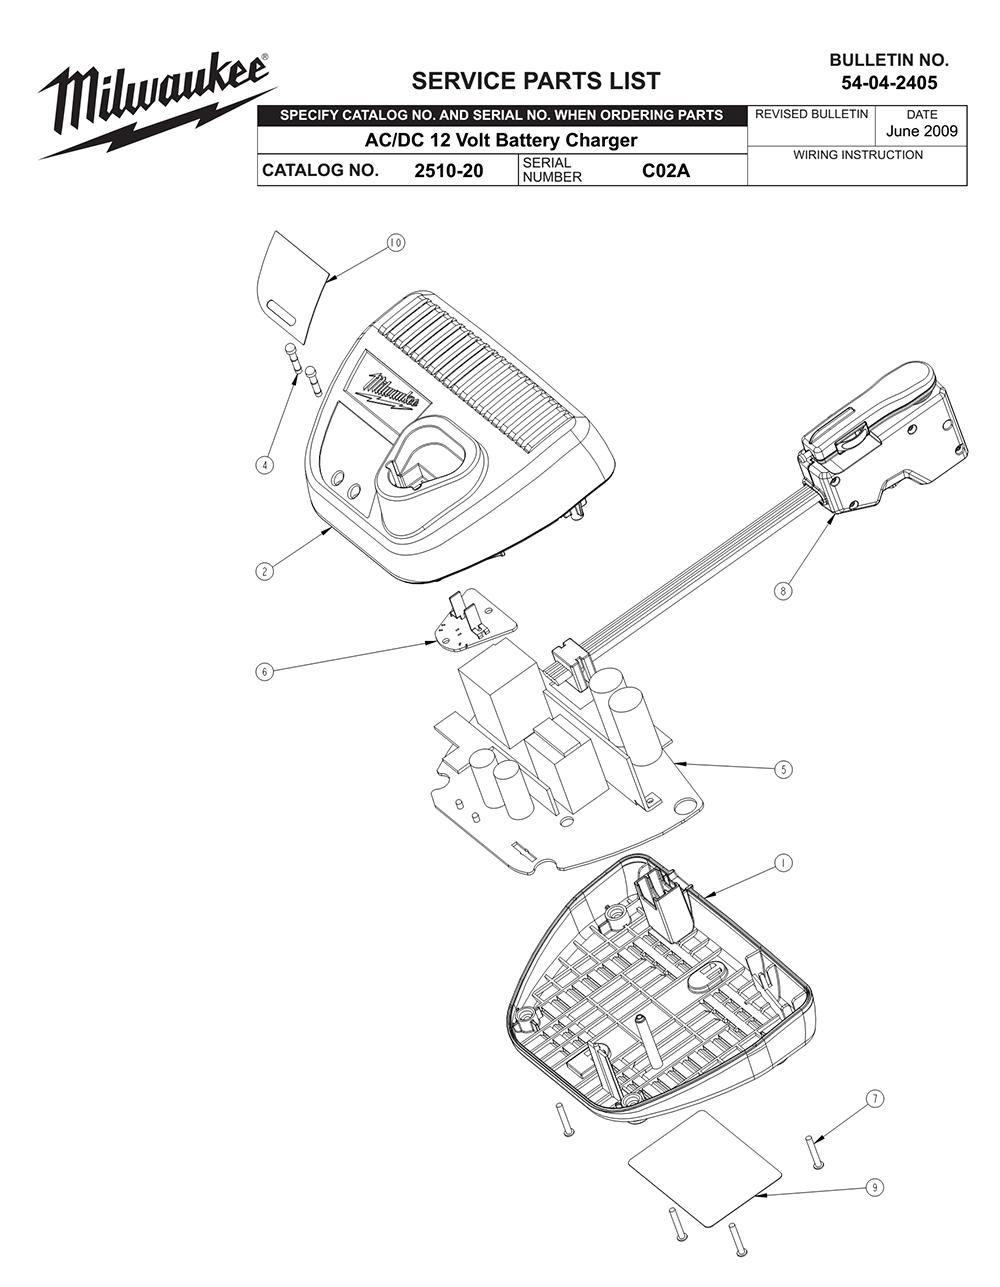 12 Volt Wiring Diagram Yamaha G1. Diagram. Auto Wiring Diagram